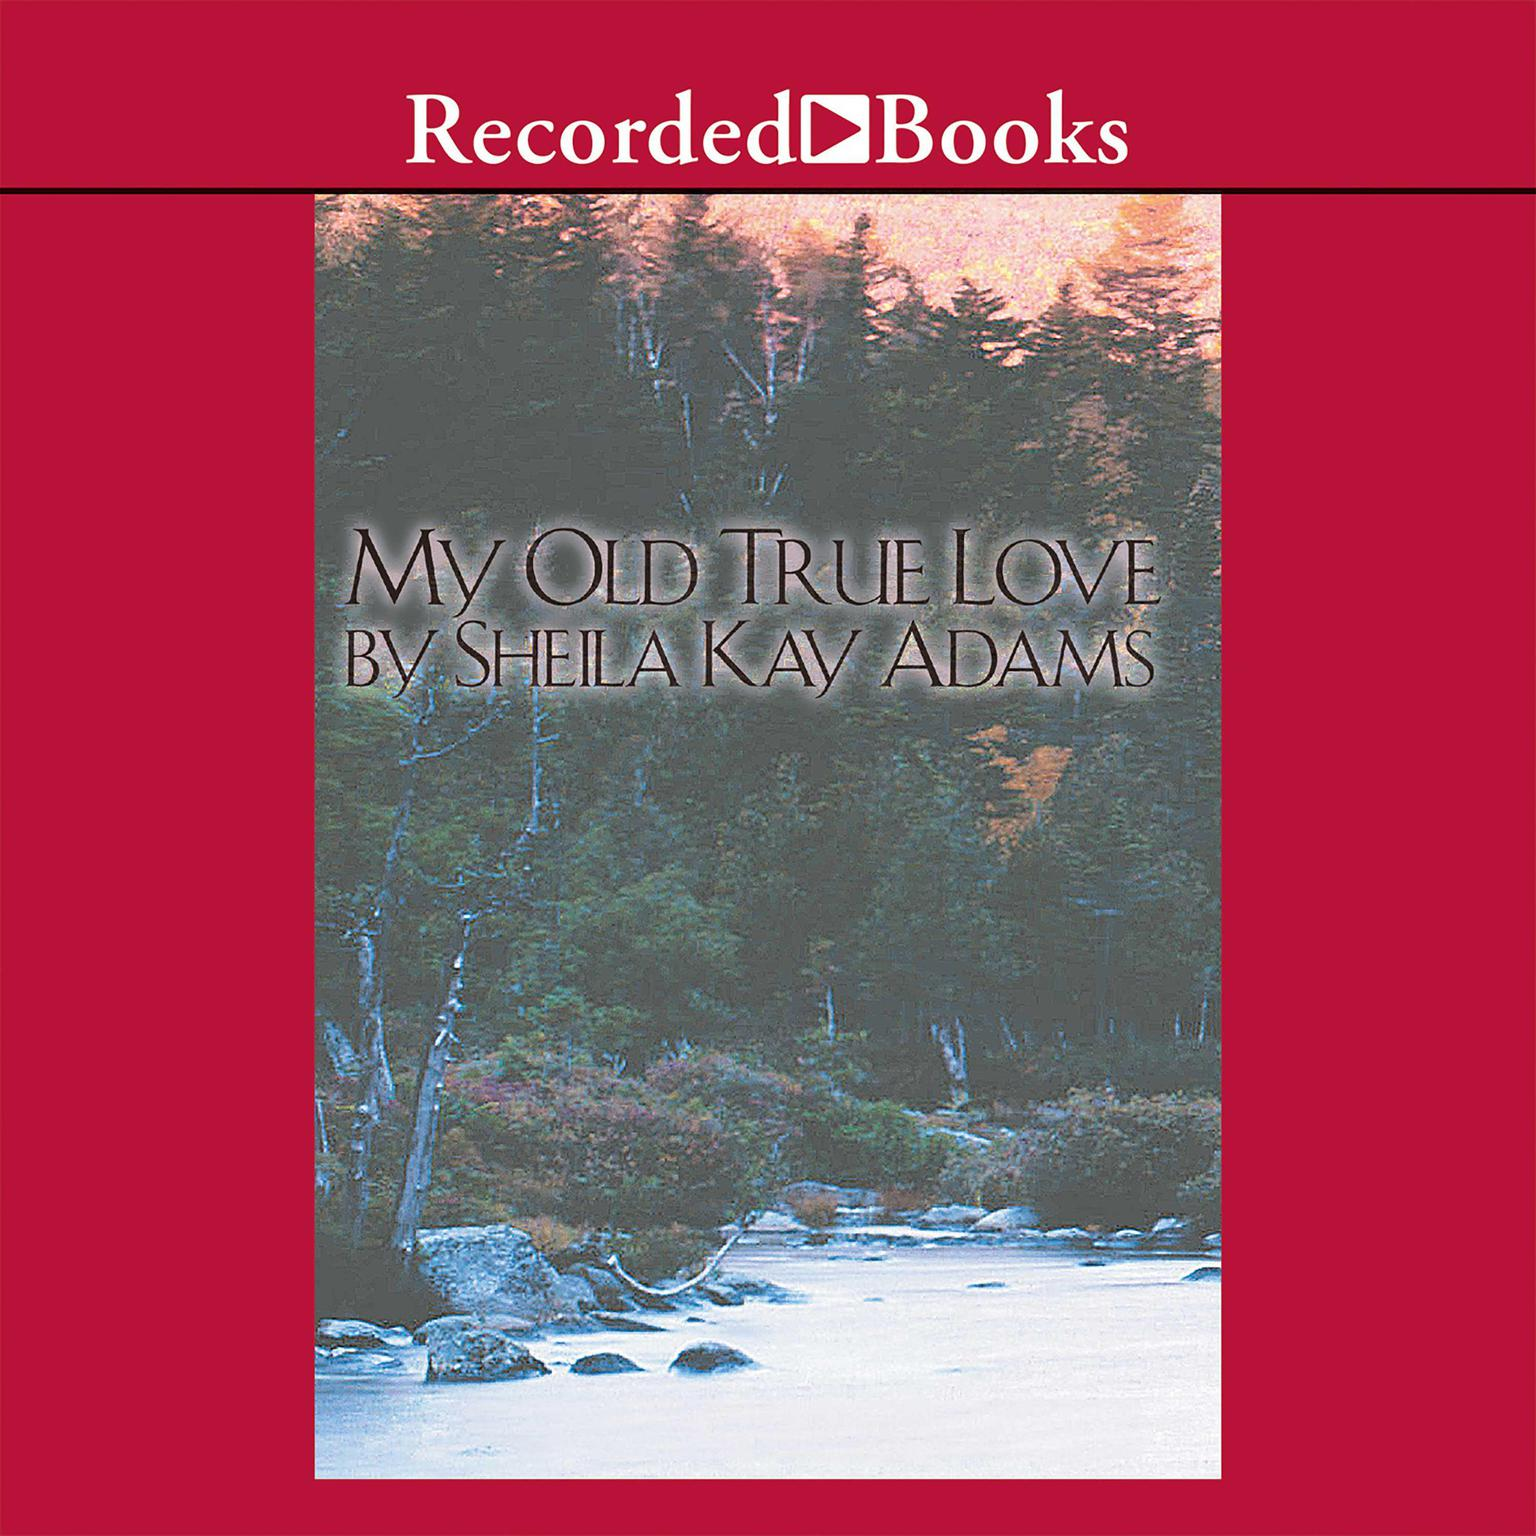 My Old True Love Audiobook, by Sheila Kay Adams